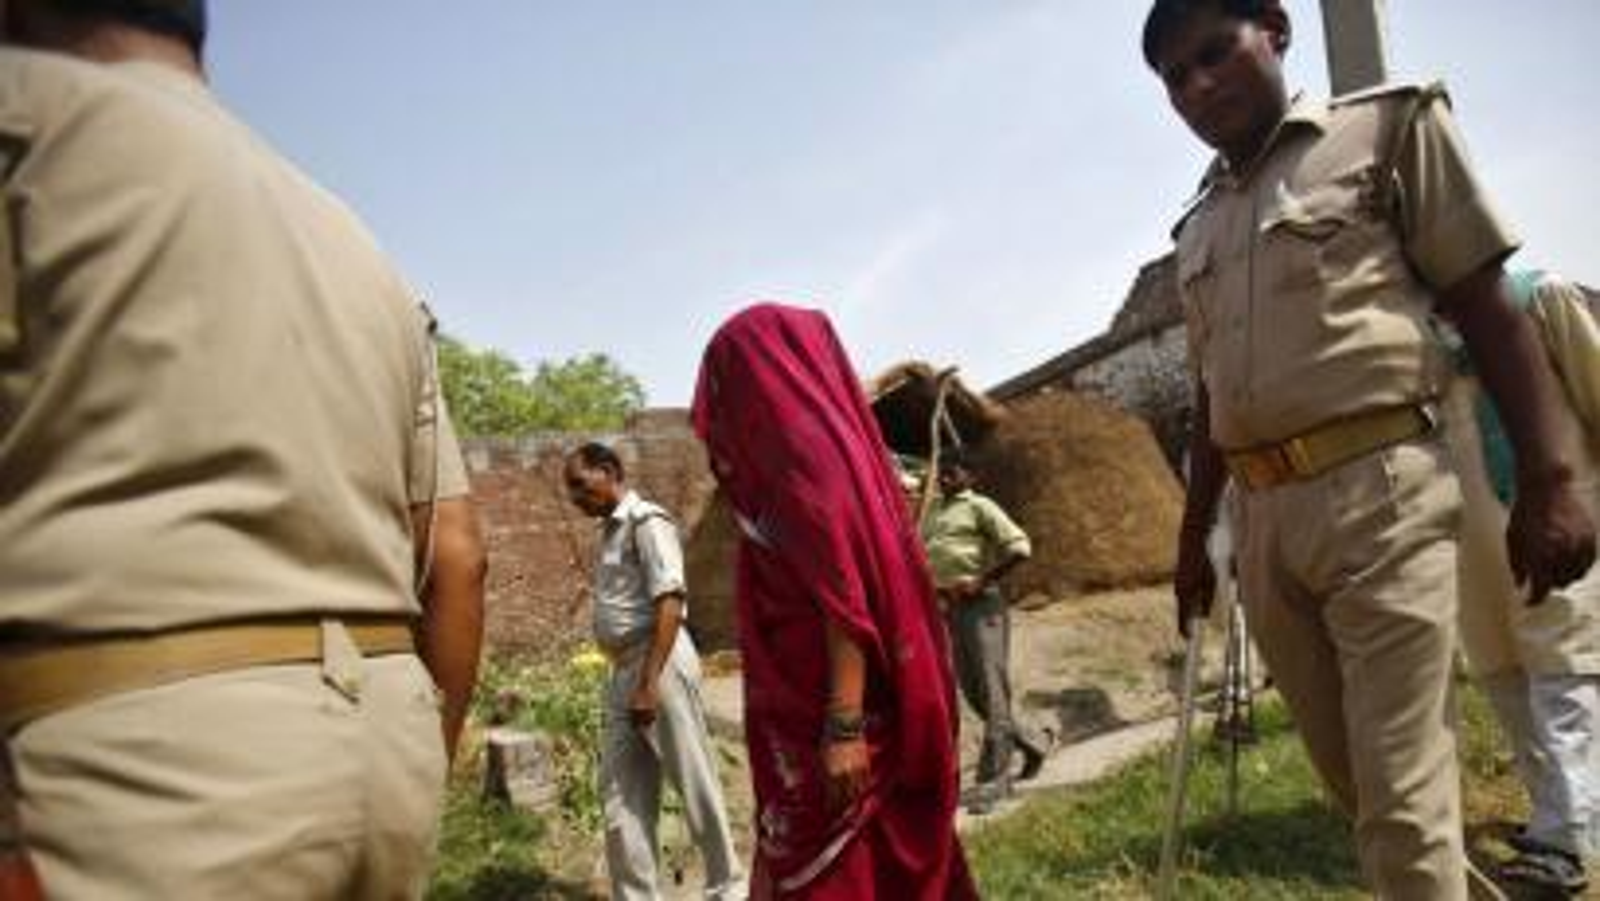 India-Rape-Uttar Pradesh-Budaun